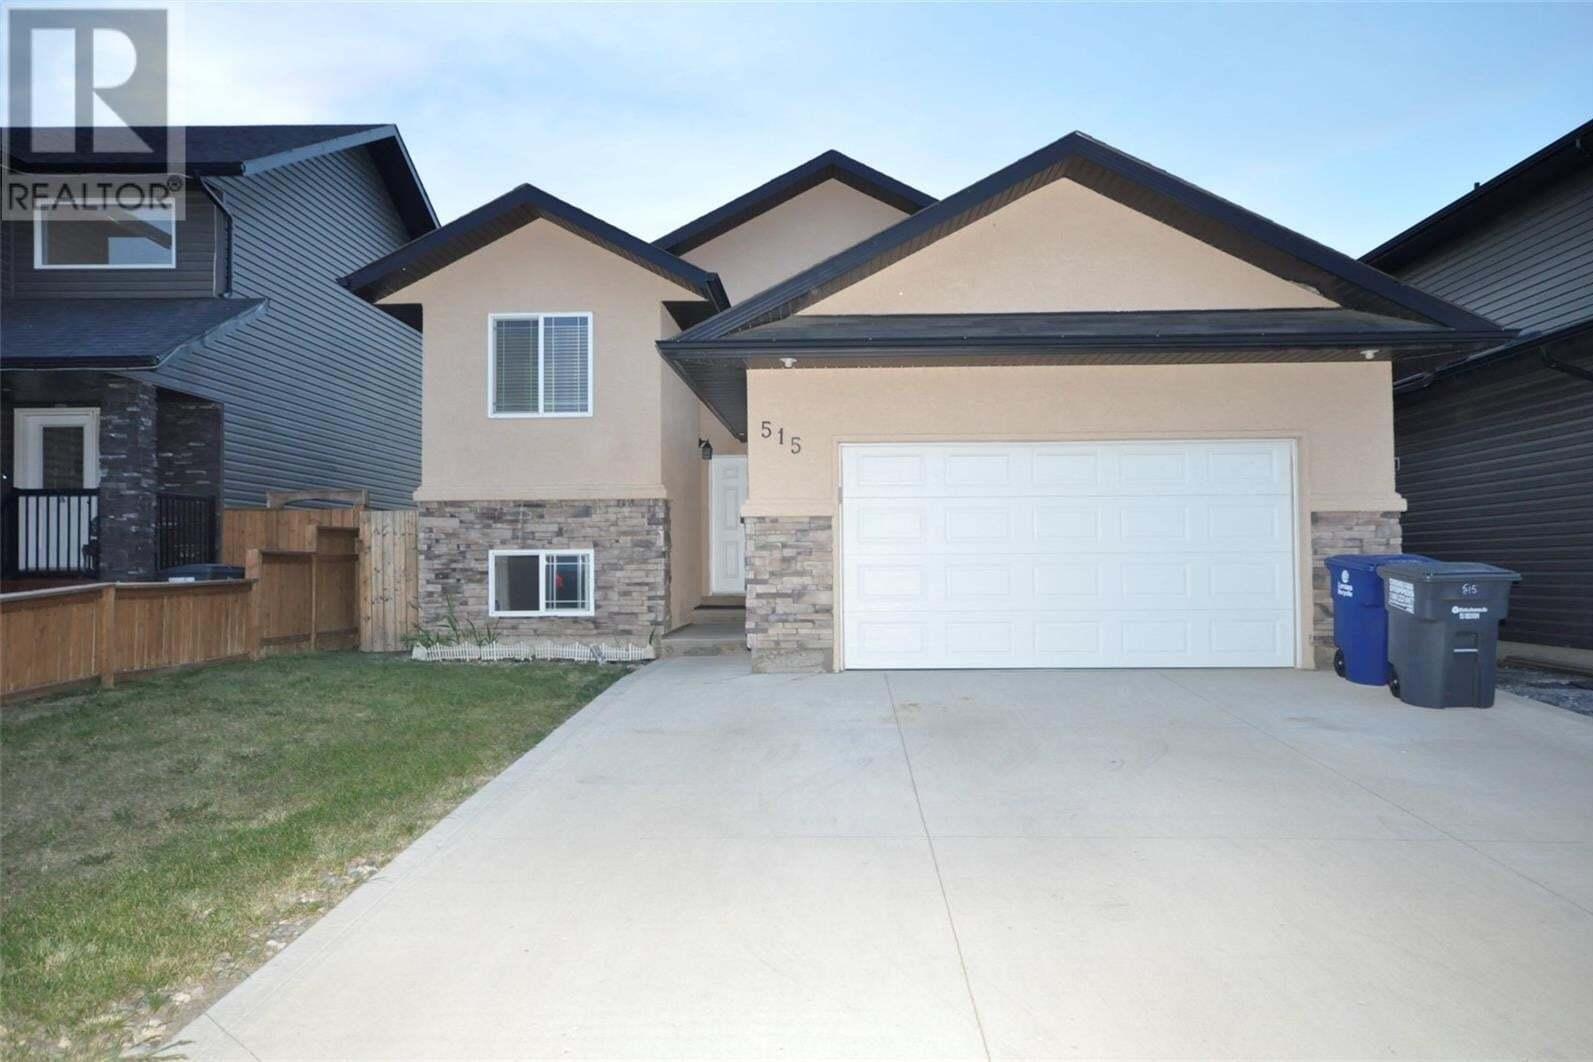 House for sale at 515 Klassen Cres Saskatoon Saskatchewan - MLS: SK824548